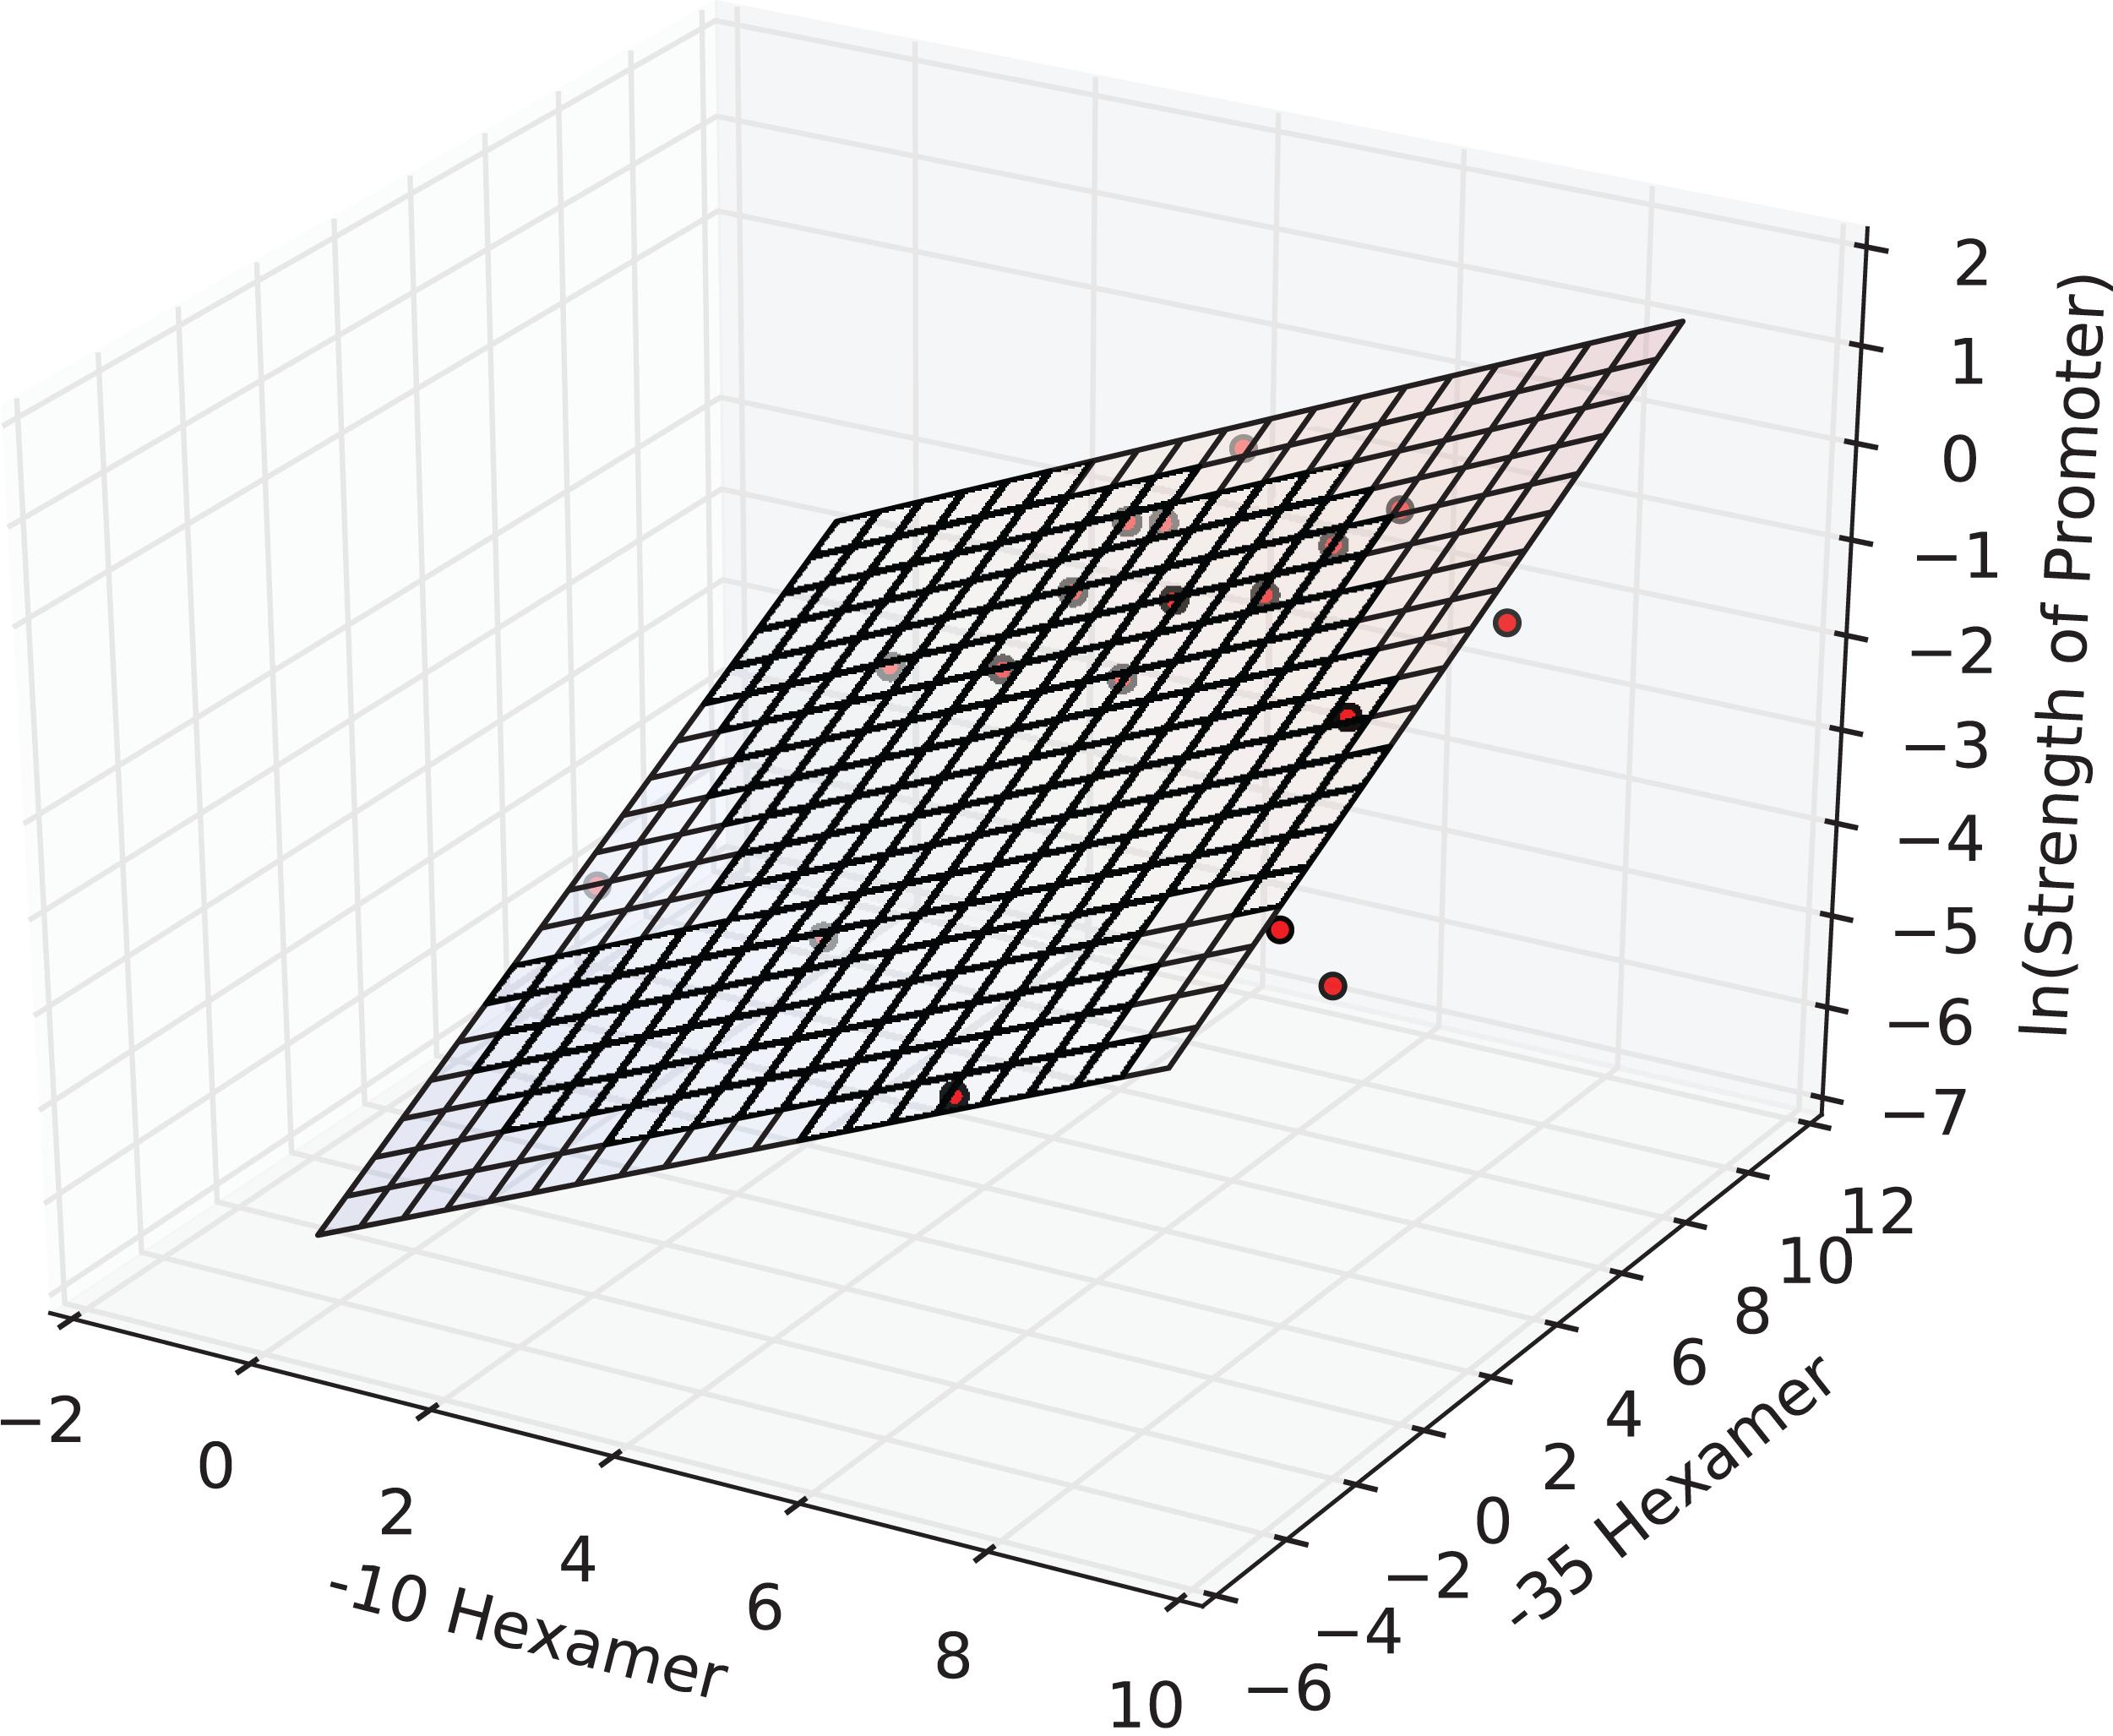 PromoterPredict: sequence-based modelling of Escherichia